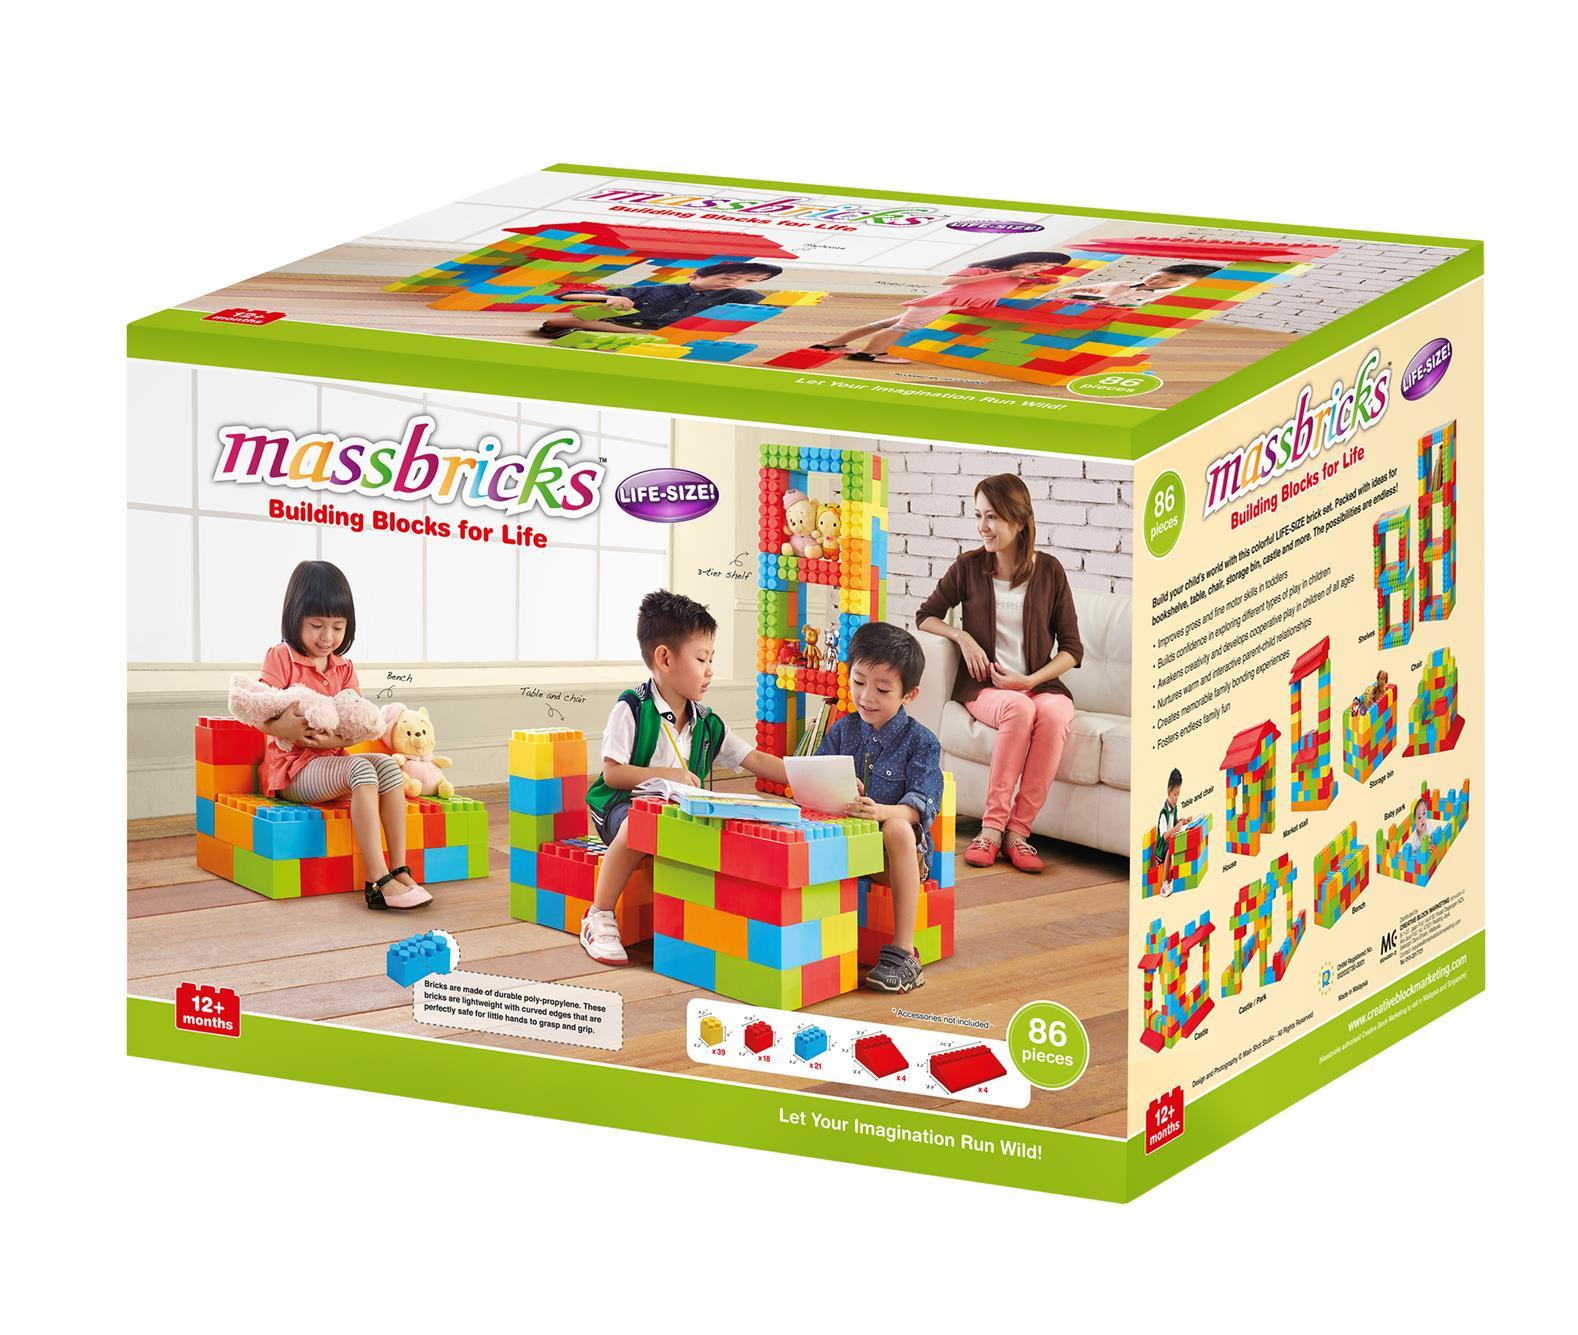 Massbrick USA Giant Lego Block L end 12 11 2017 12 15 AM